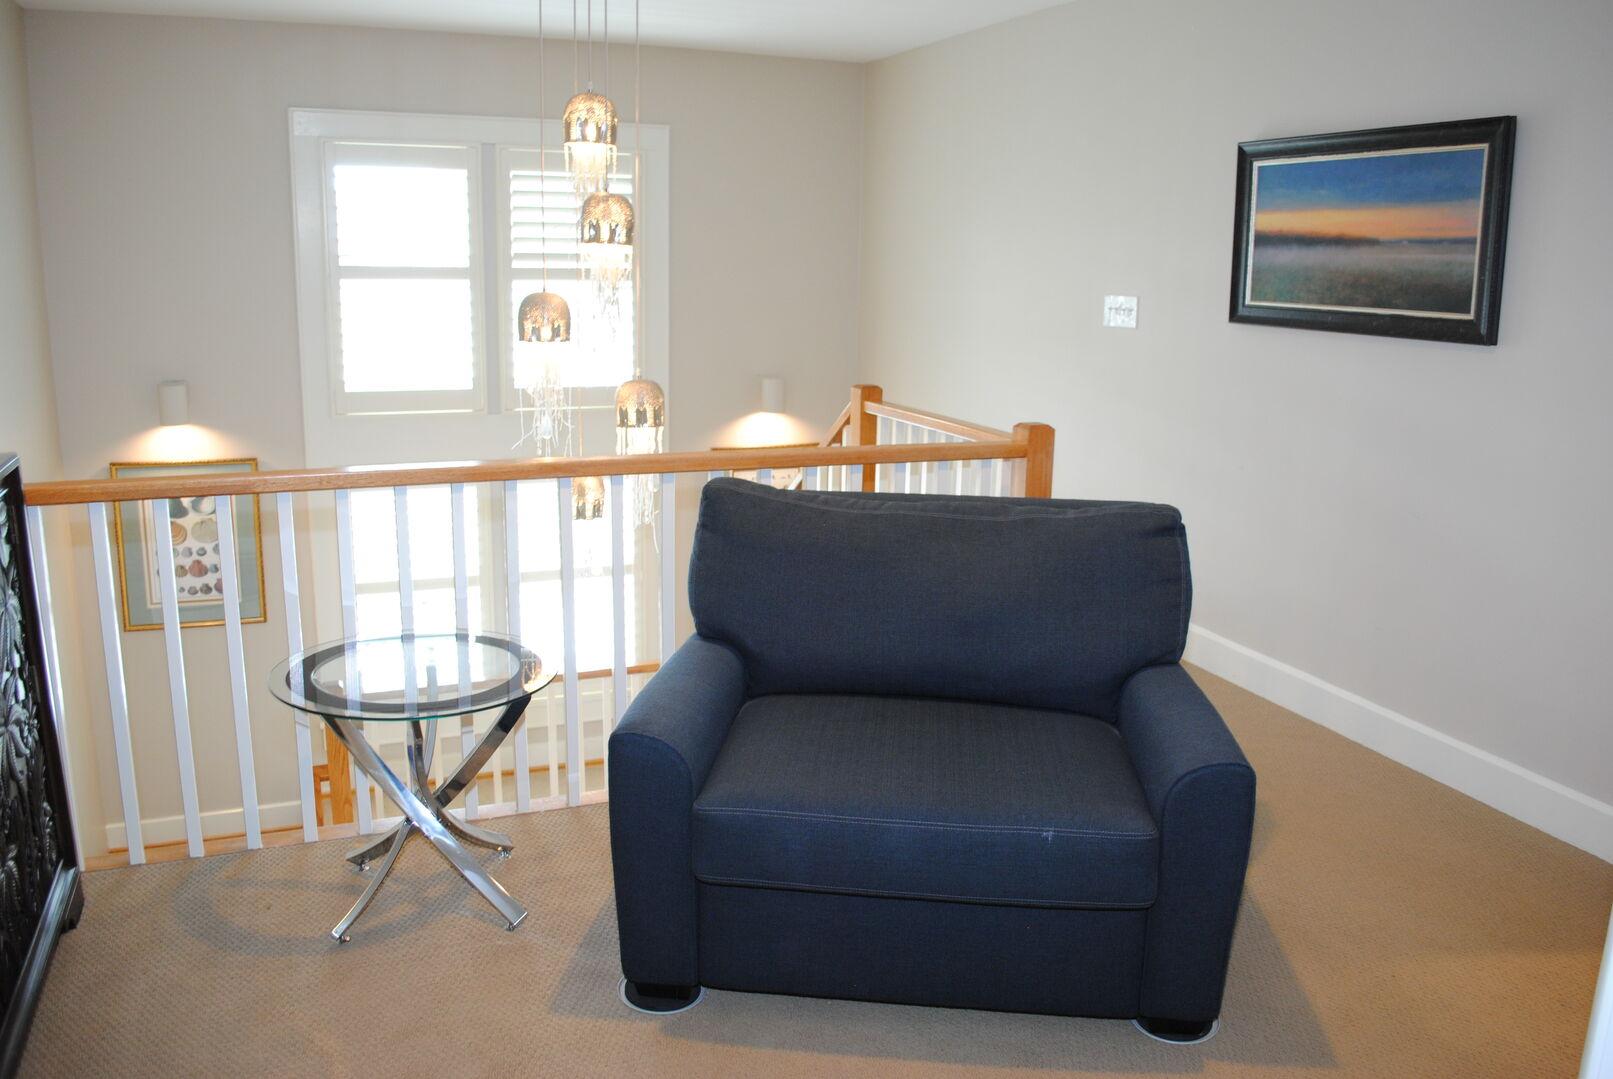 Twin Sleeper Chair - Second Floor